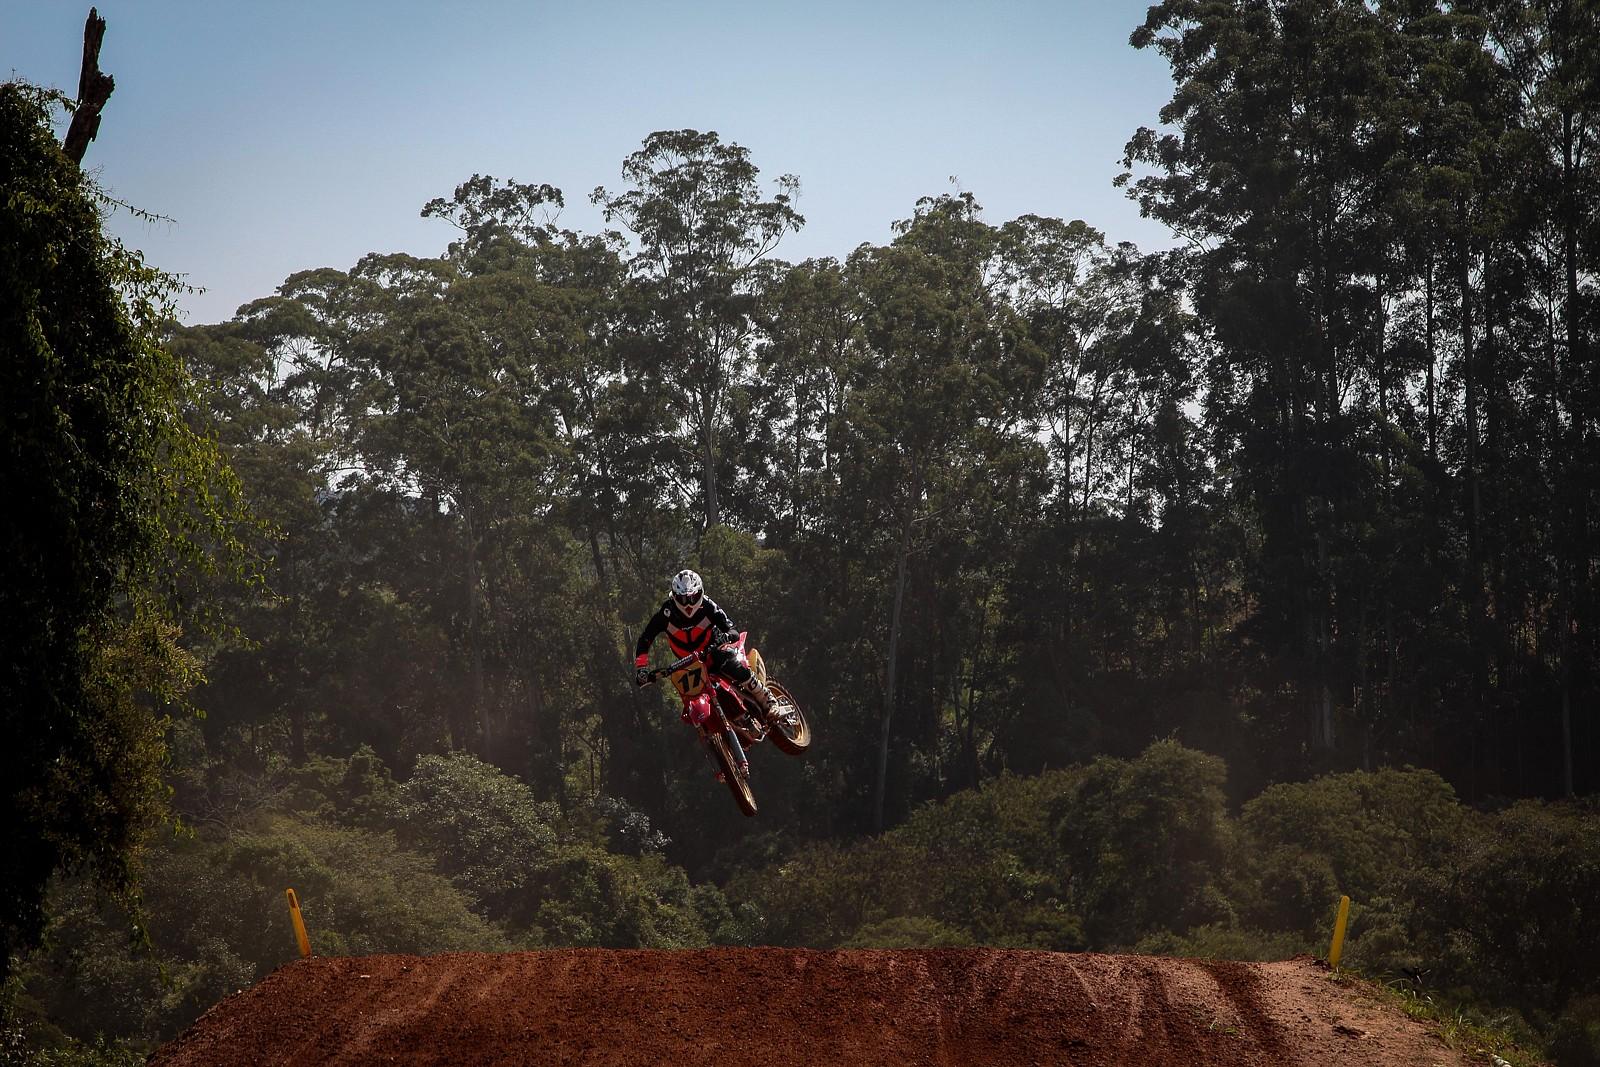 Kalango Cego  Itupeva SP - Caio Luiz Figueiredo Filho - Motocross Pictures - Vital MX